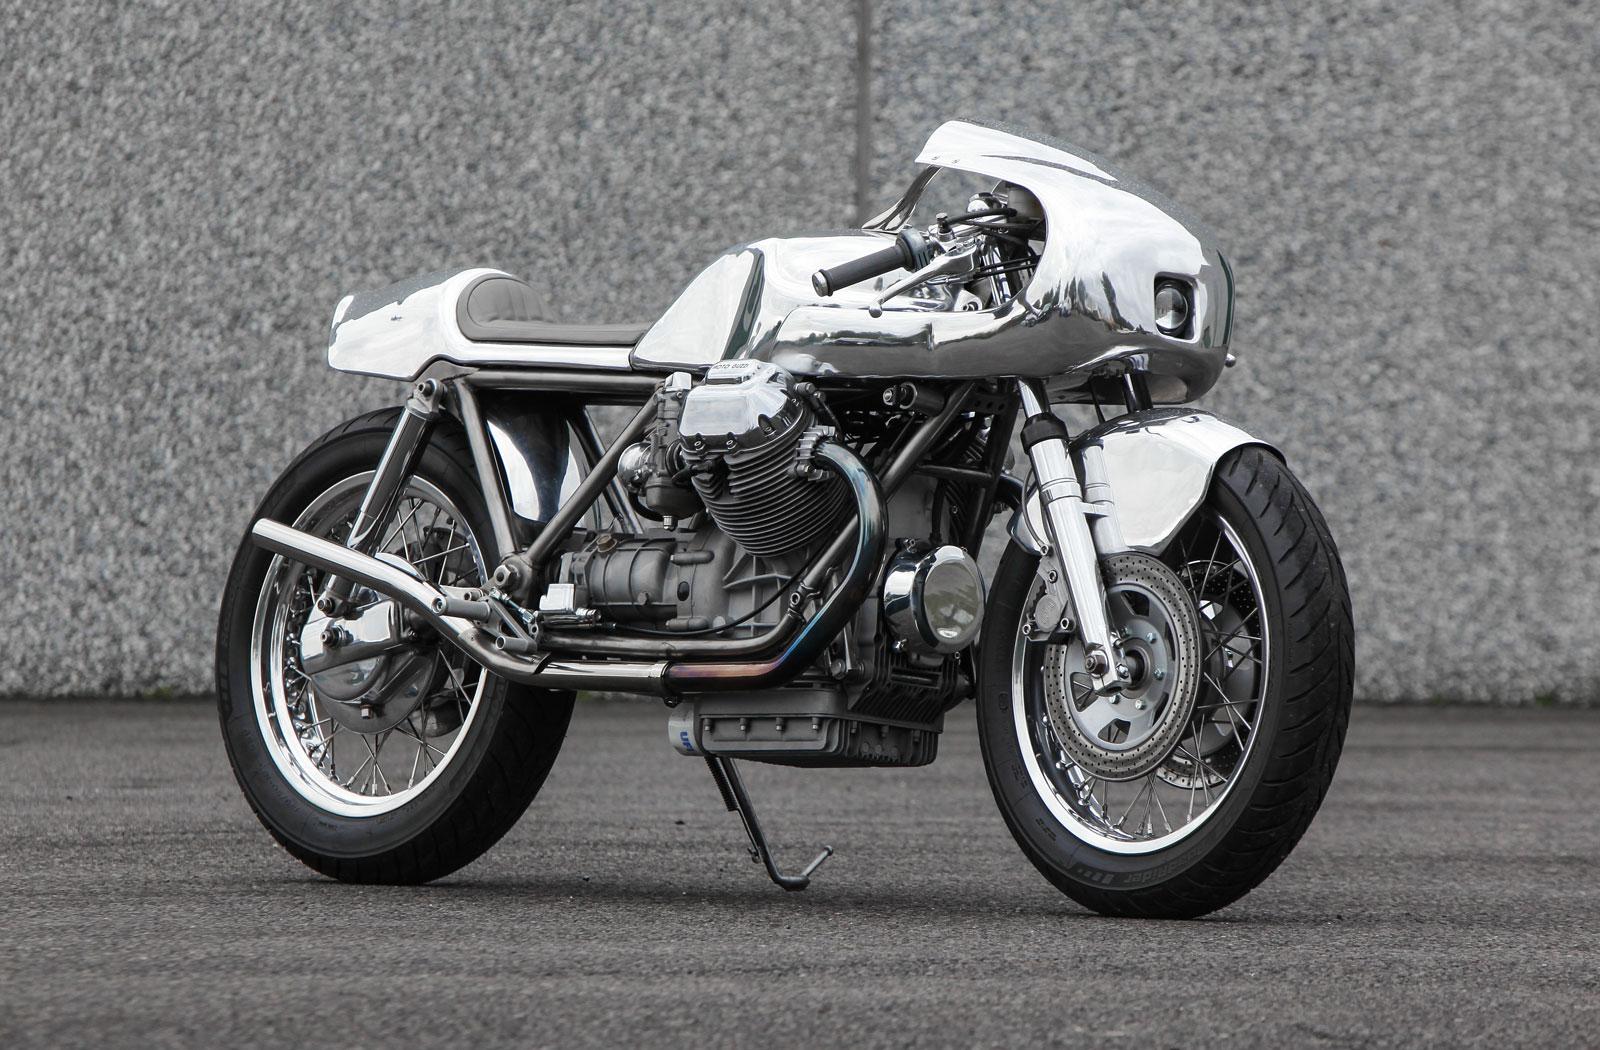 Moto Guzzi 1000SP cafe racer